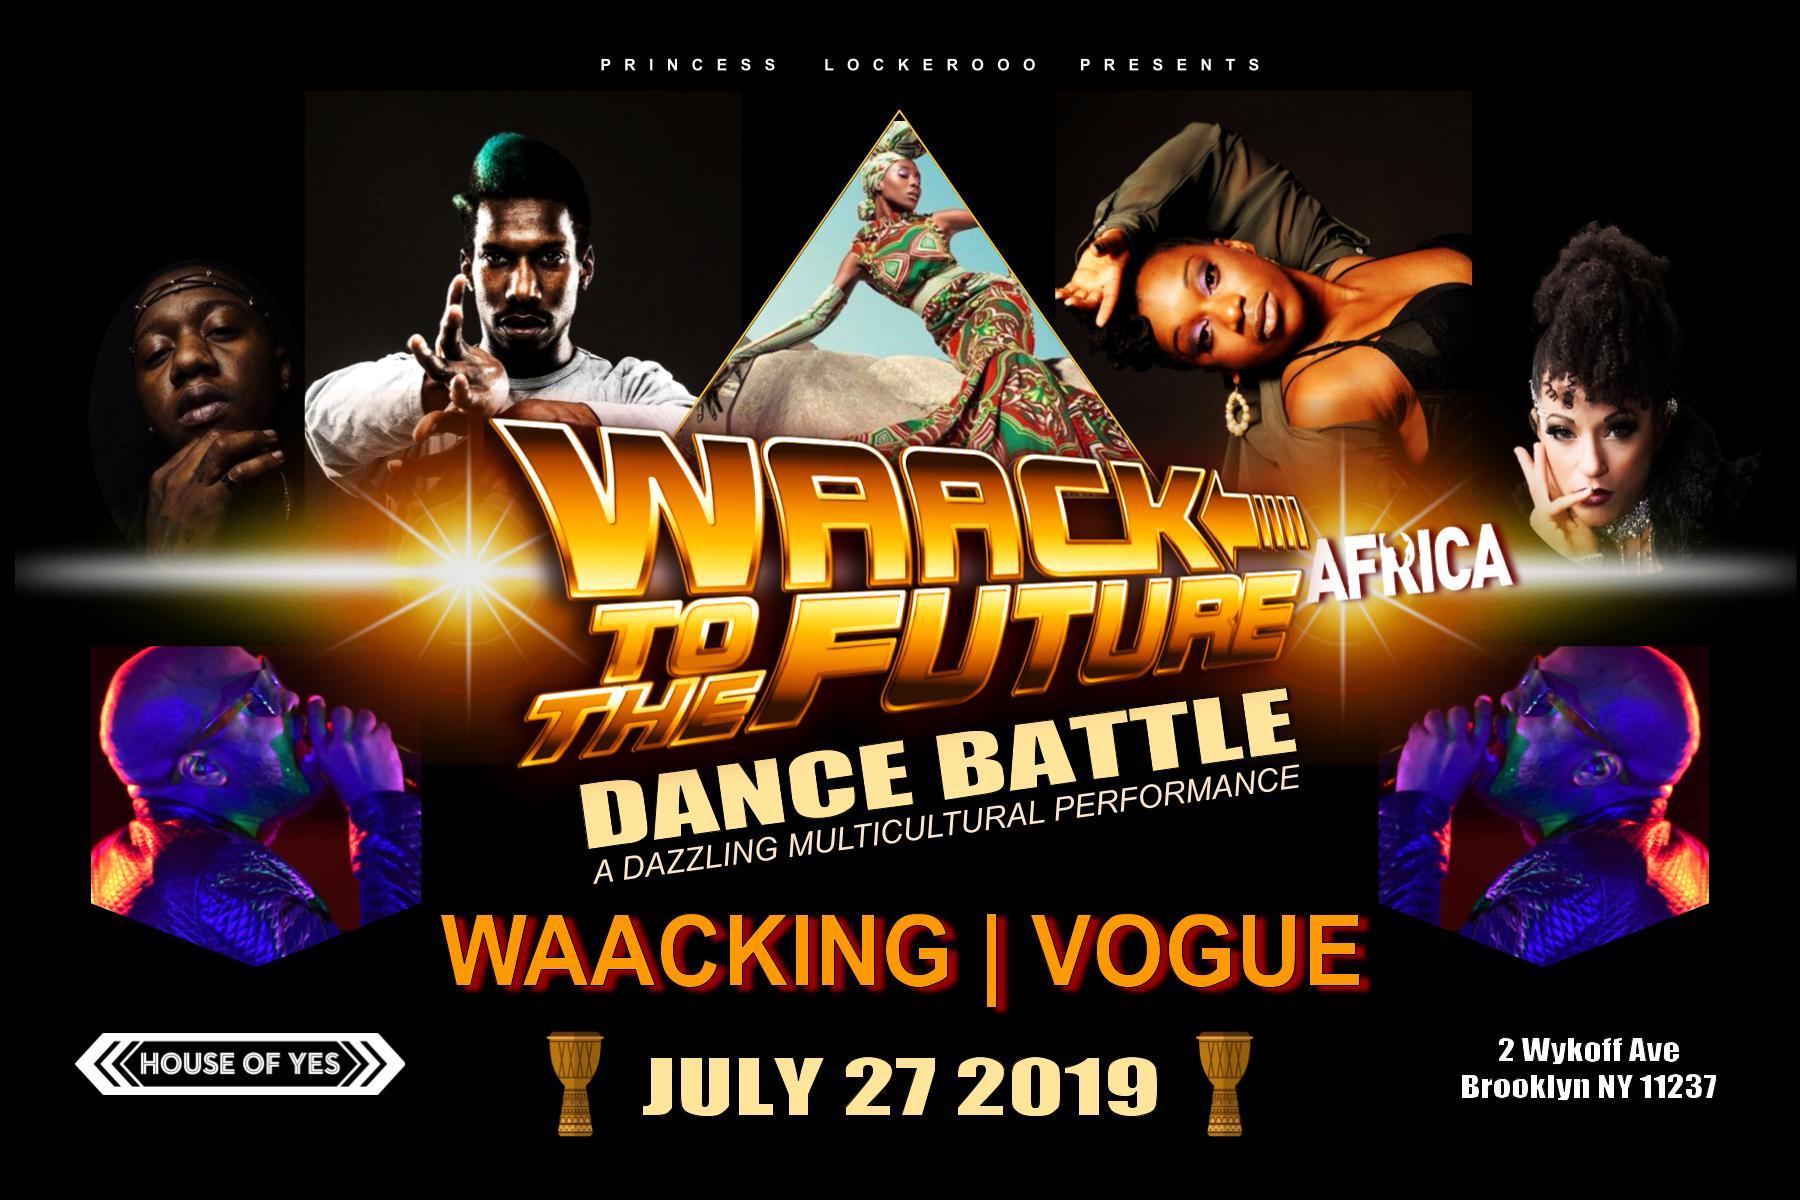 waack to the future dance battle